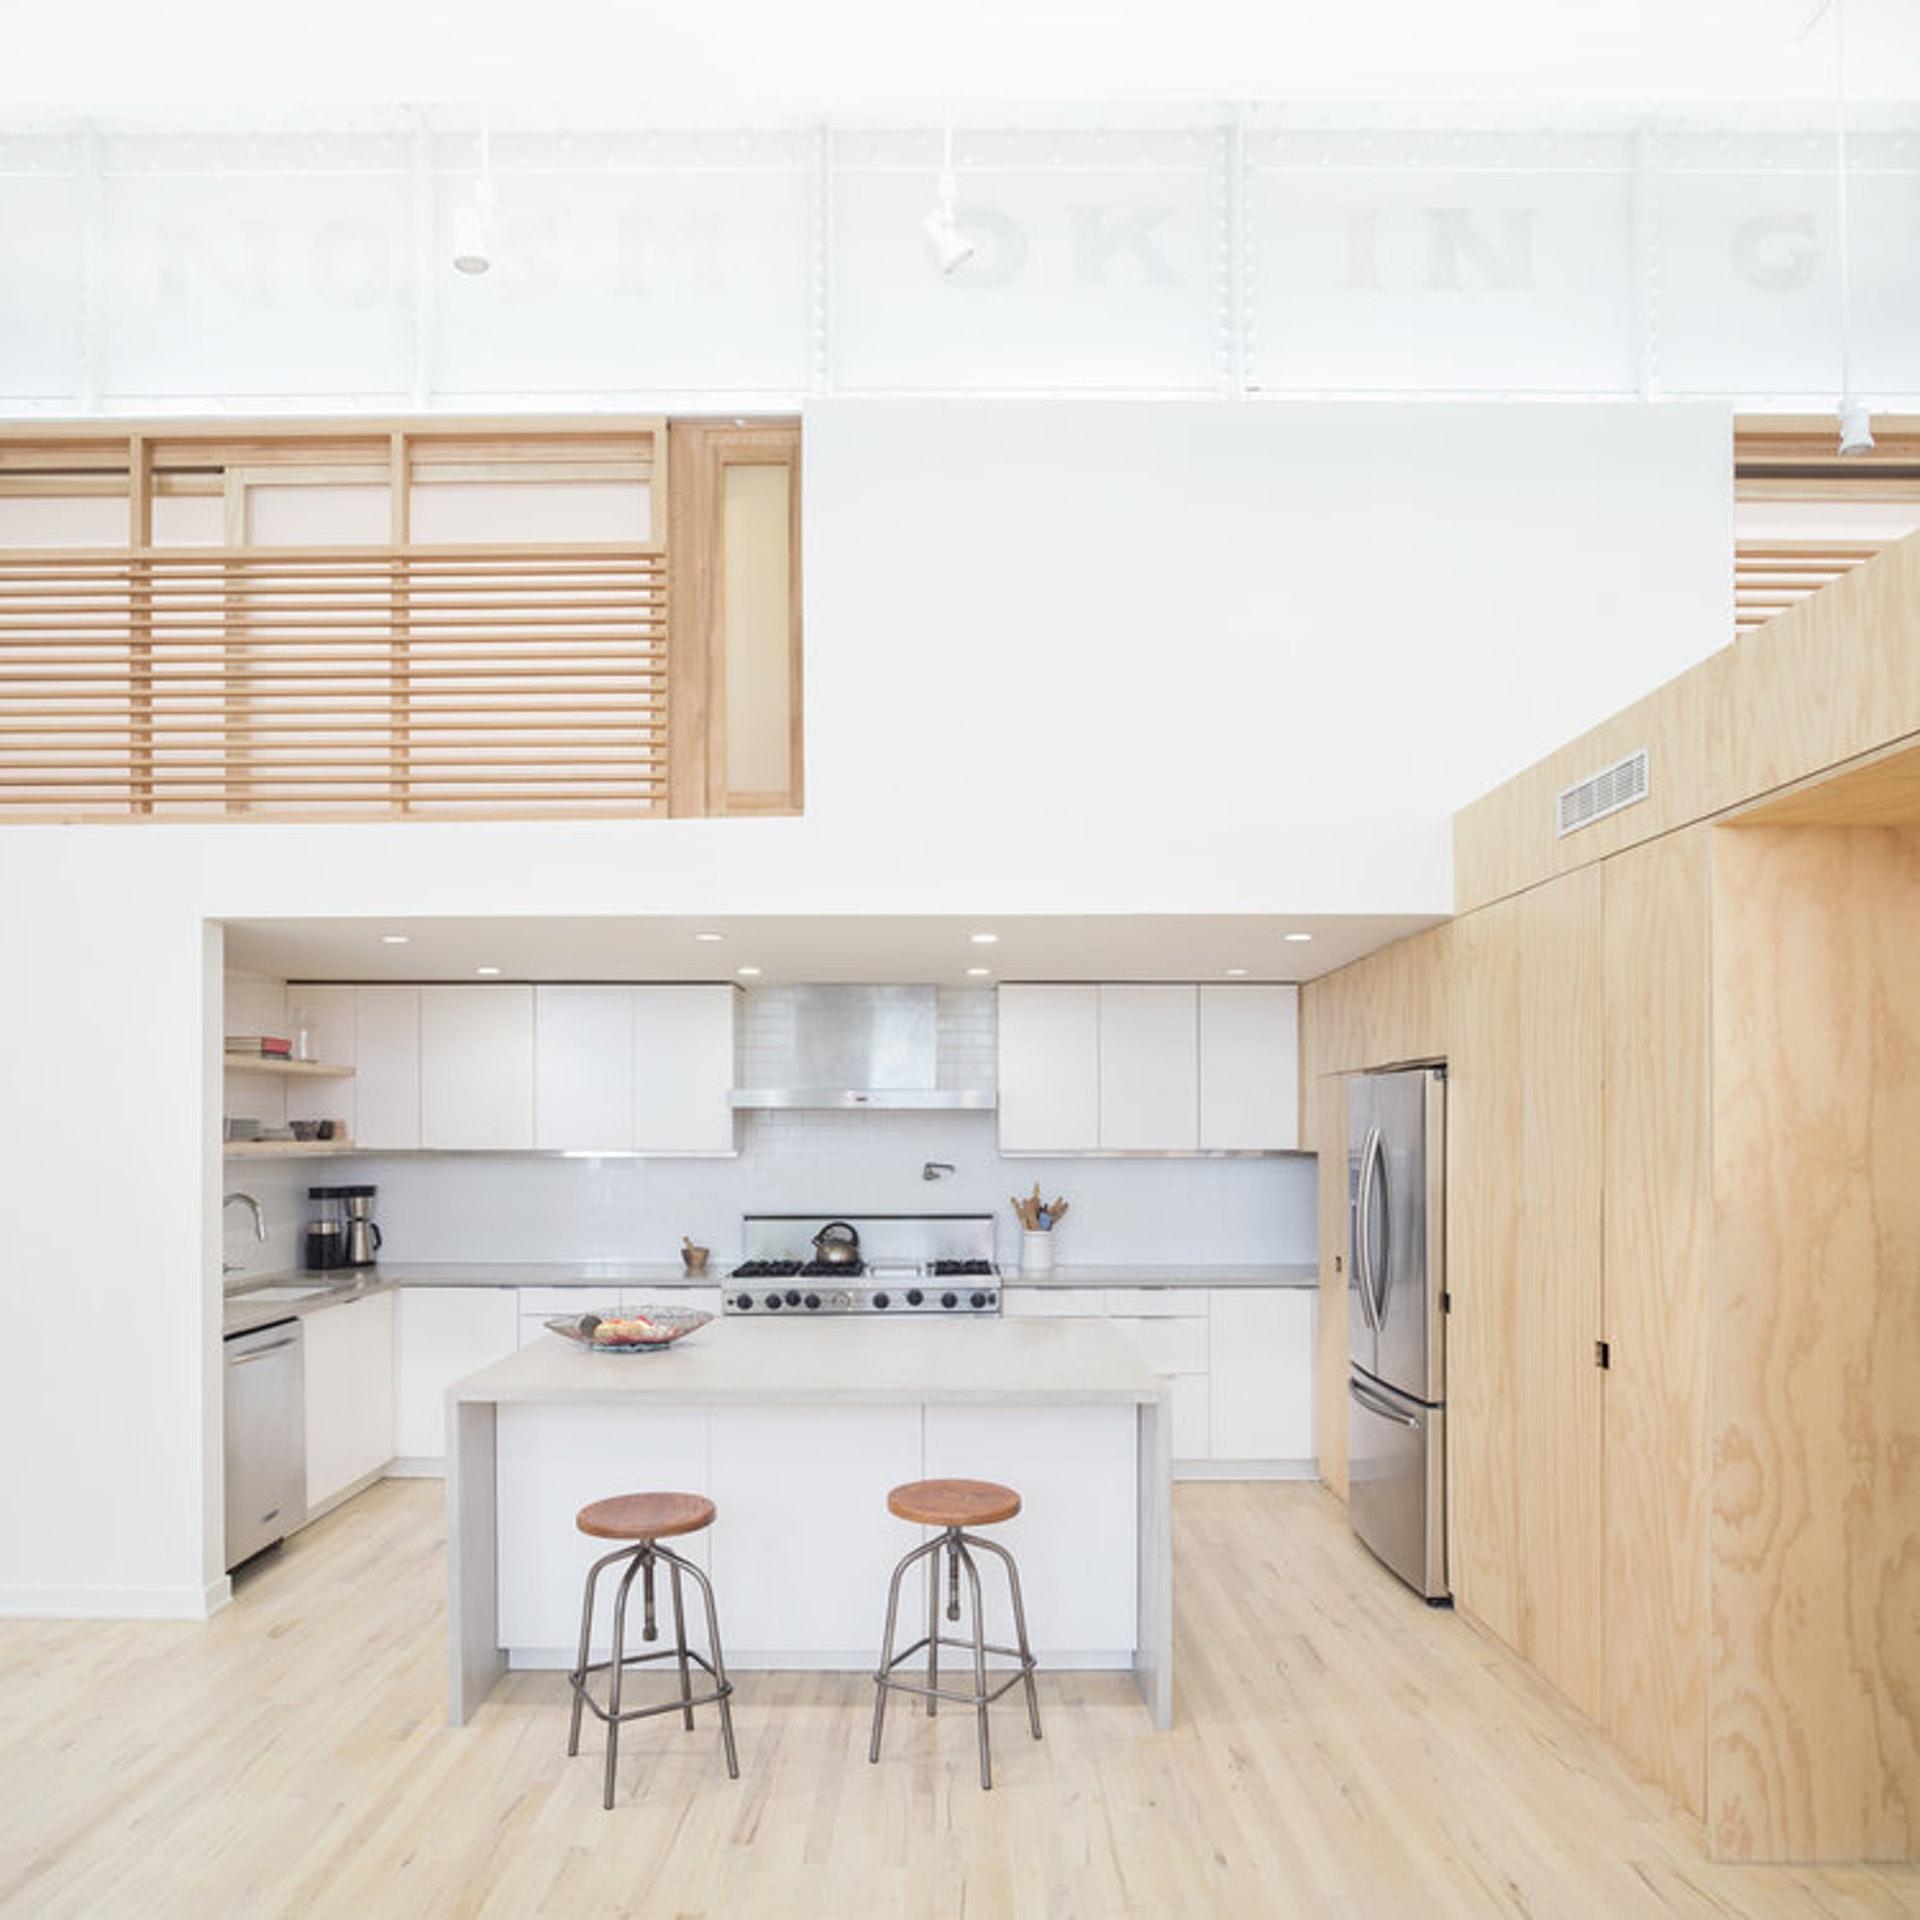 (Jeff Jordan Architects)